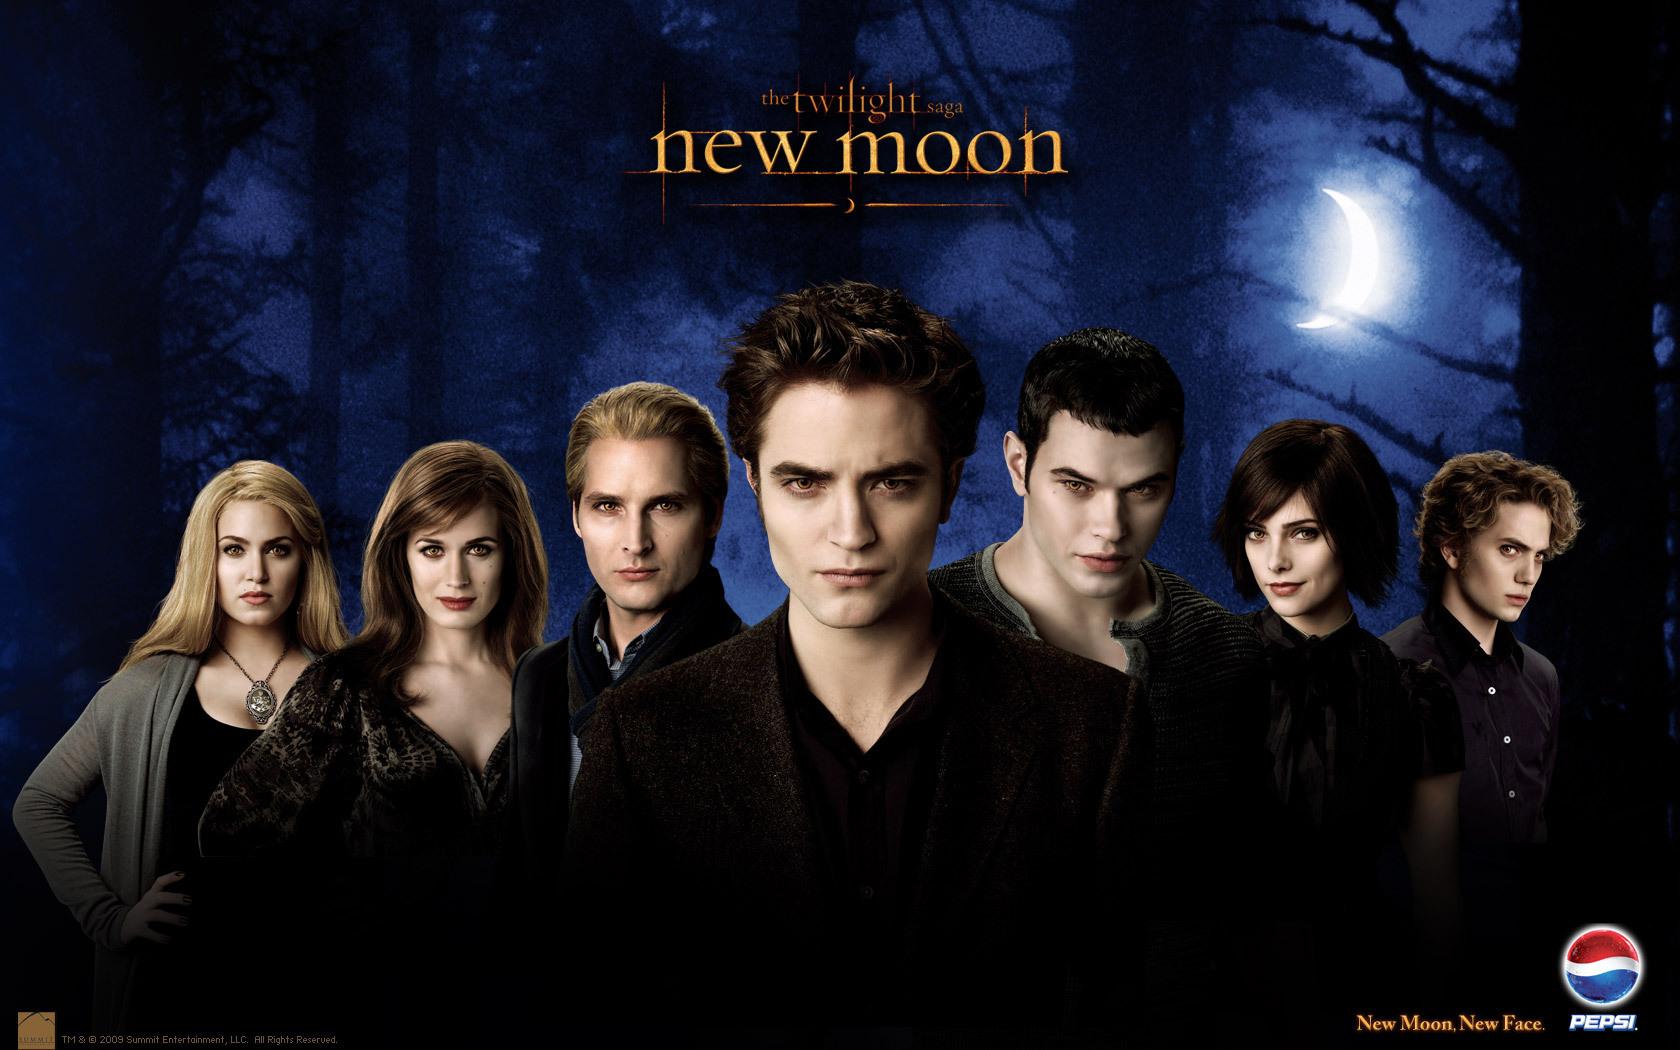 PEPSI Italy New Moon Twilight - PEPSI Italy New Moon Twilight